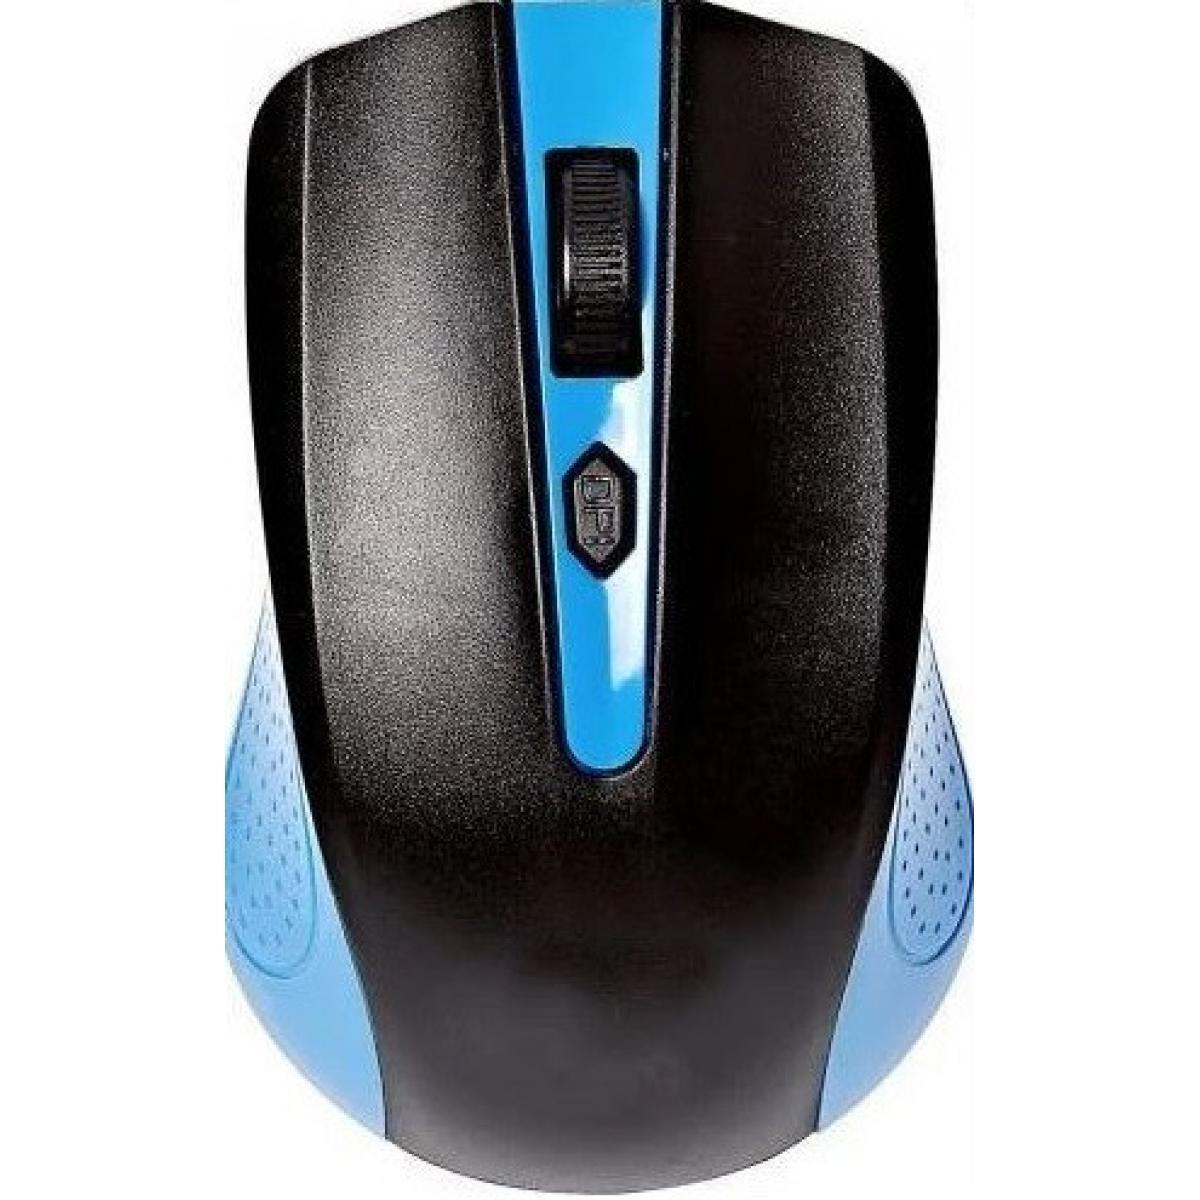 Mouse 211 Wireless USB Беспроводная мышка